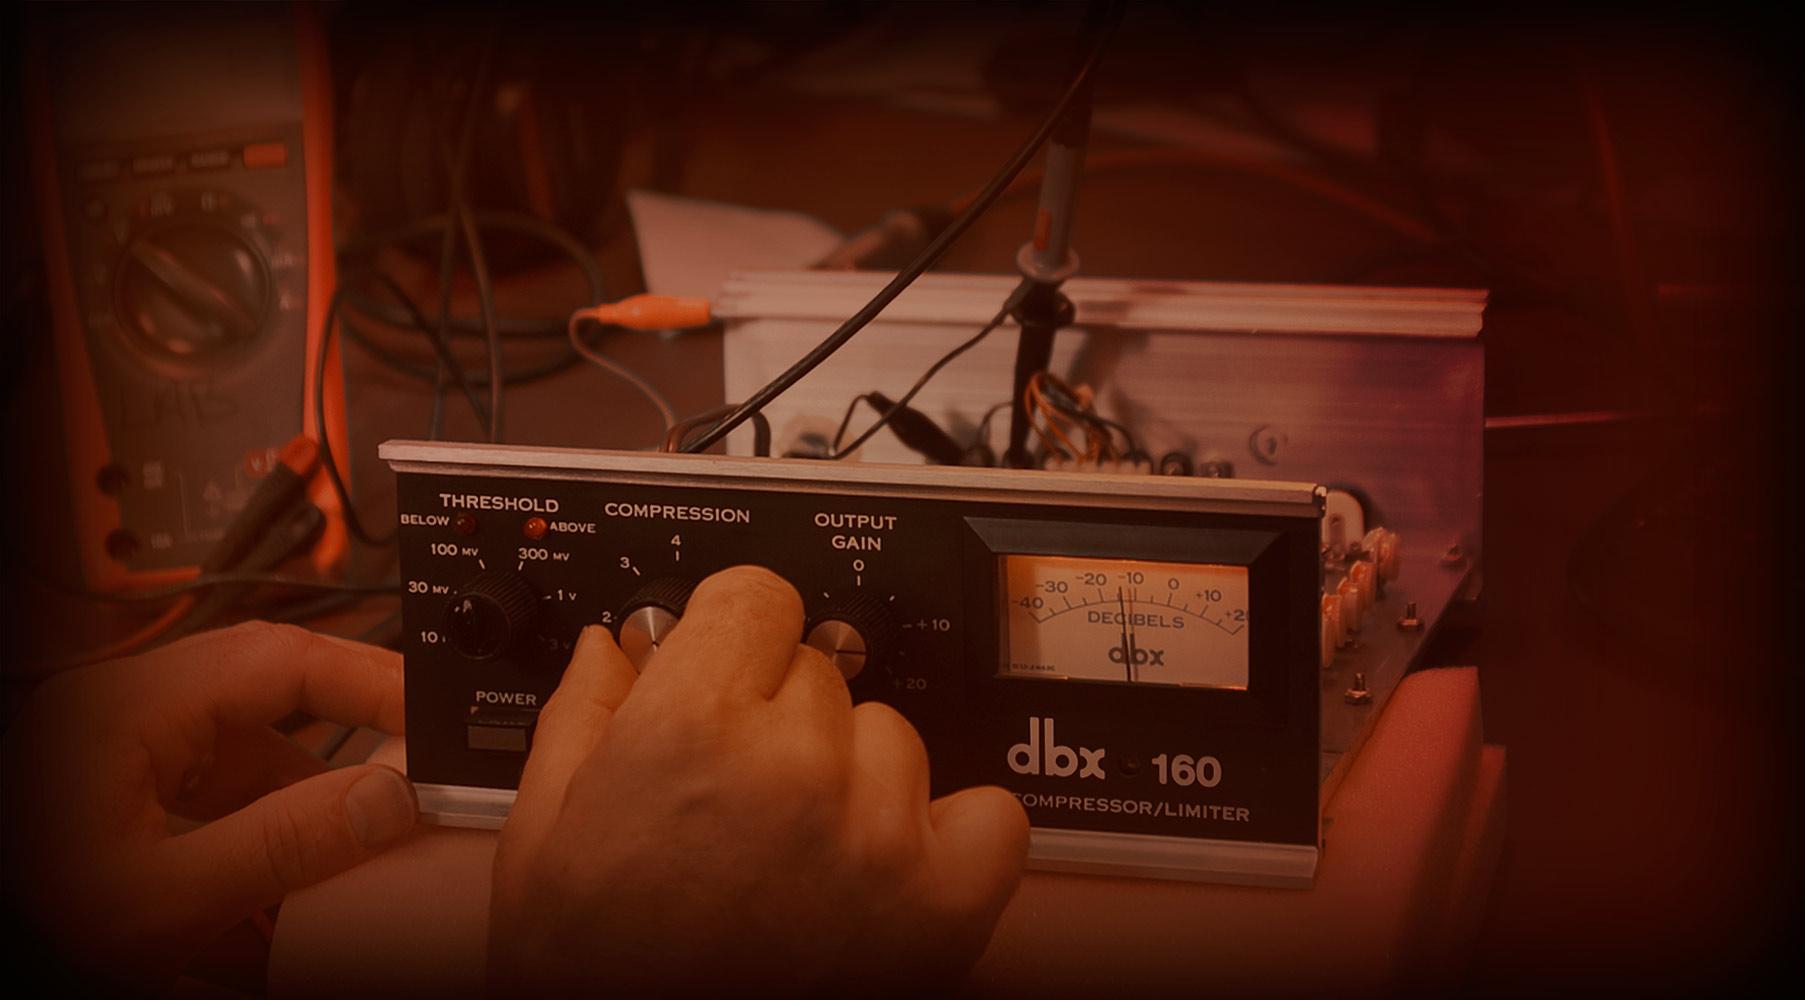 Plug-In dbx® 160 Compressor / Limiter